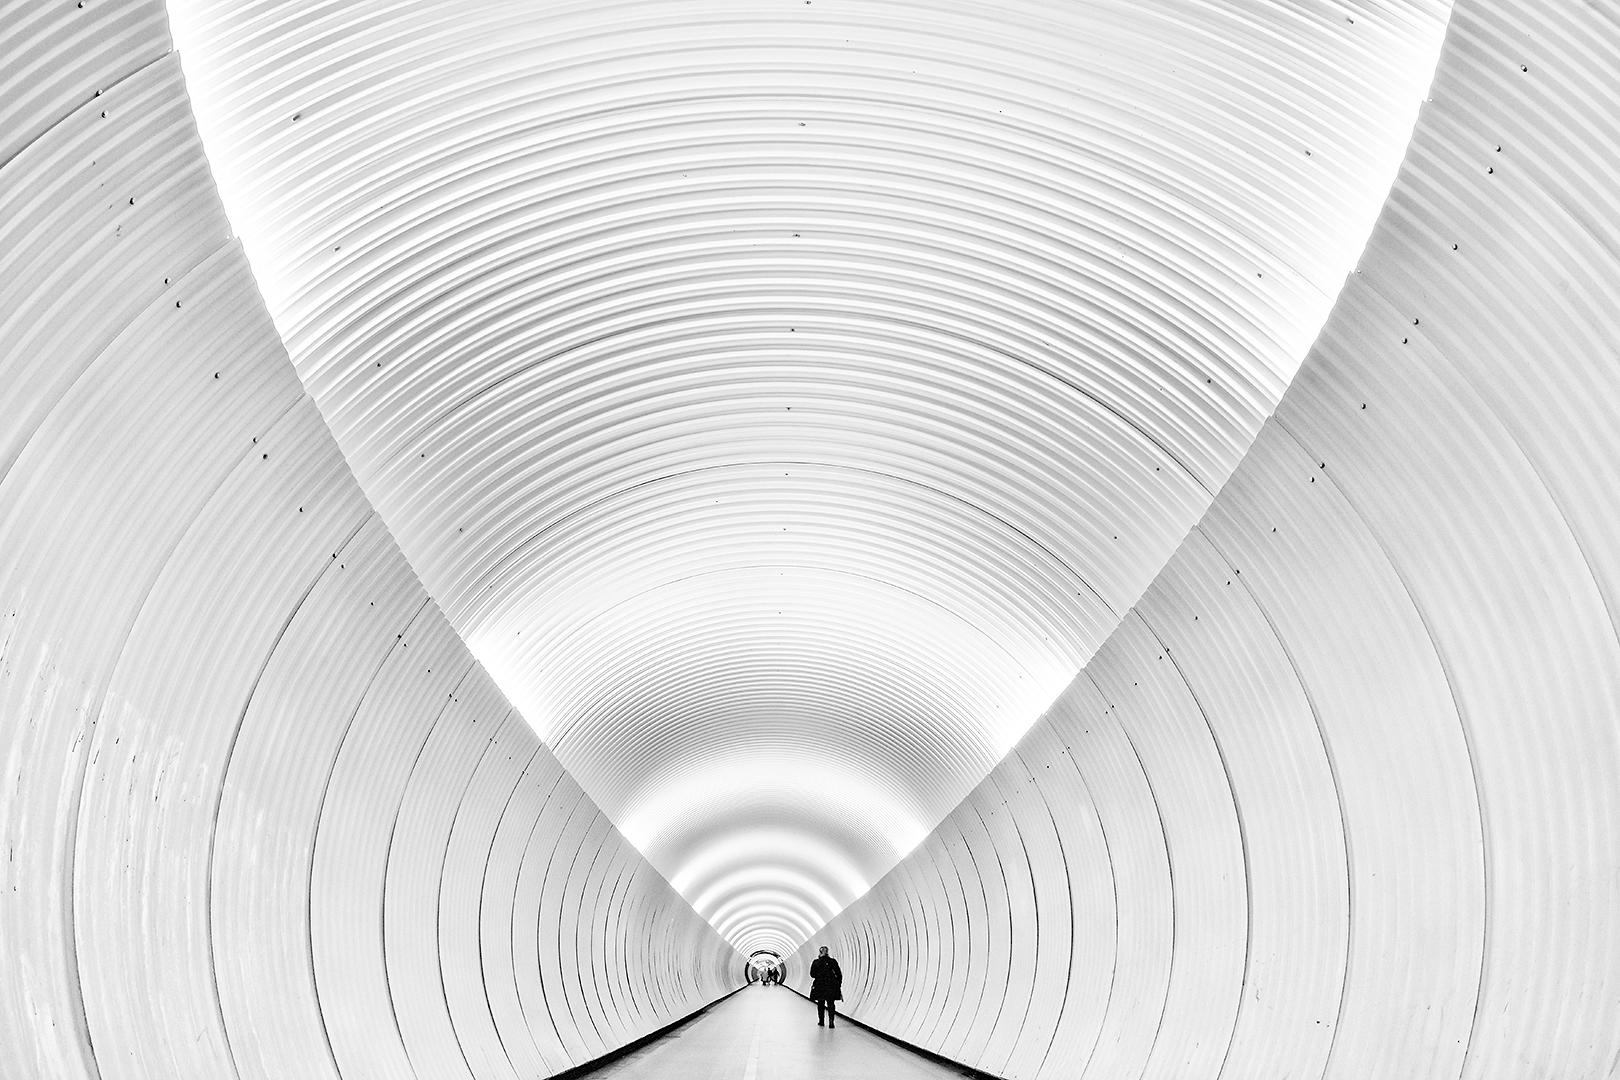 Brunkeberg tunnel, Mats Grimfoot